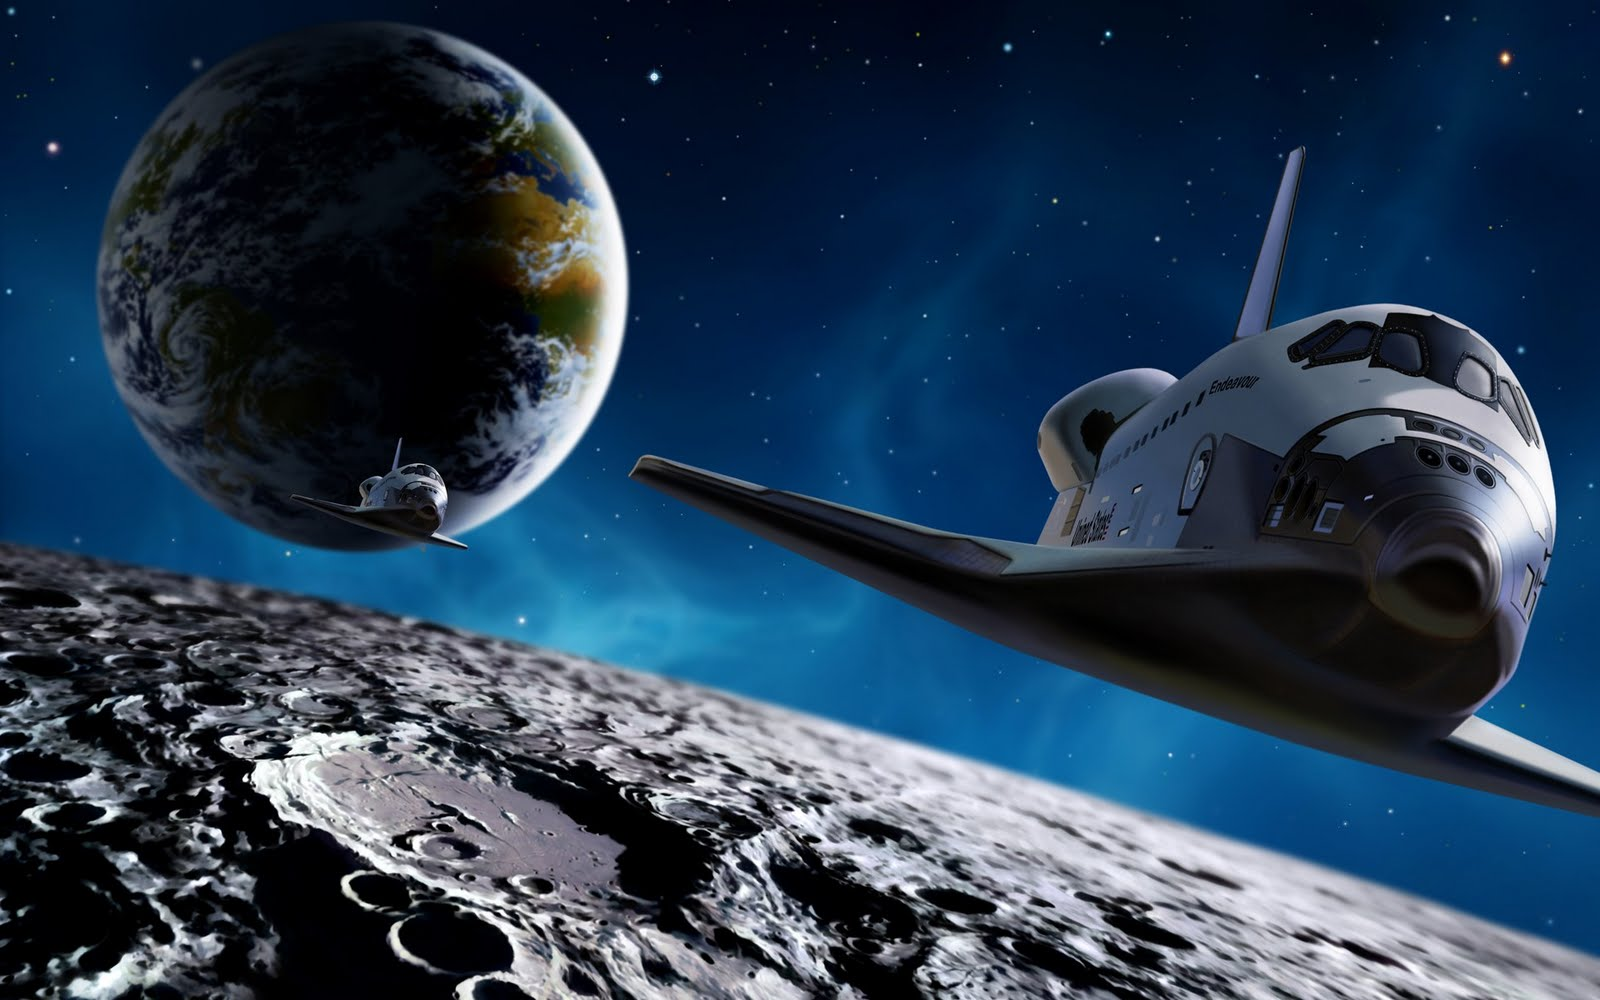 Fantasia espacial